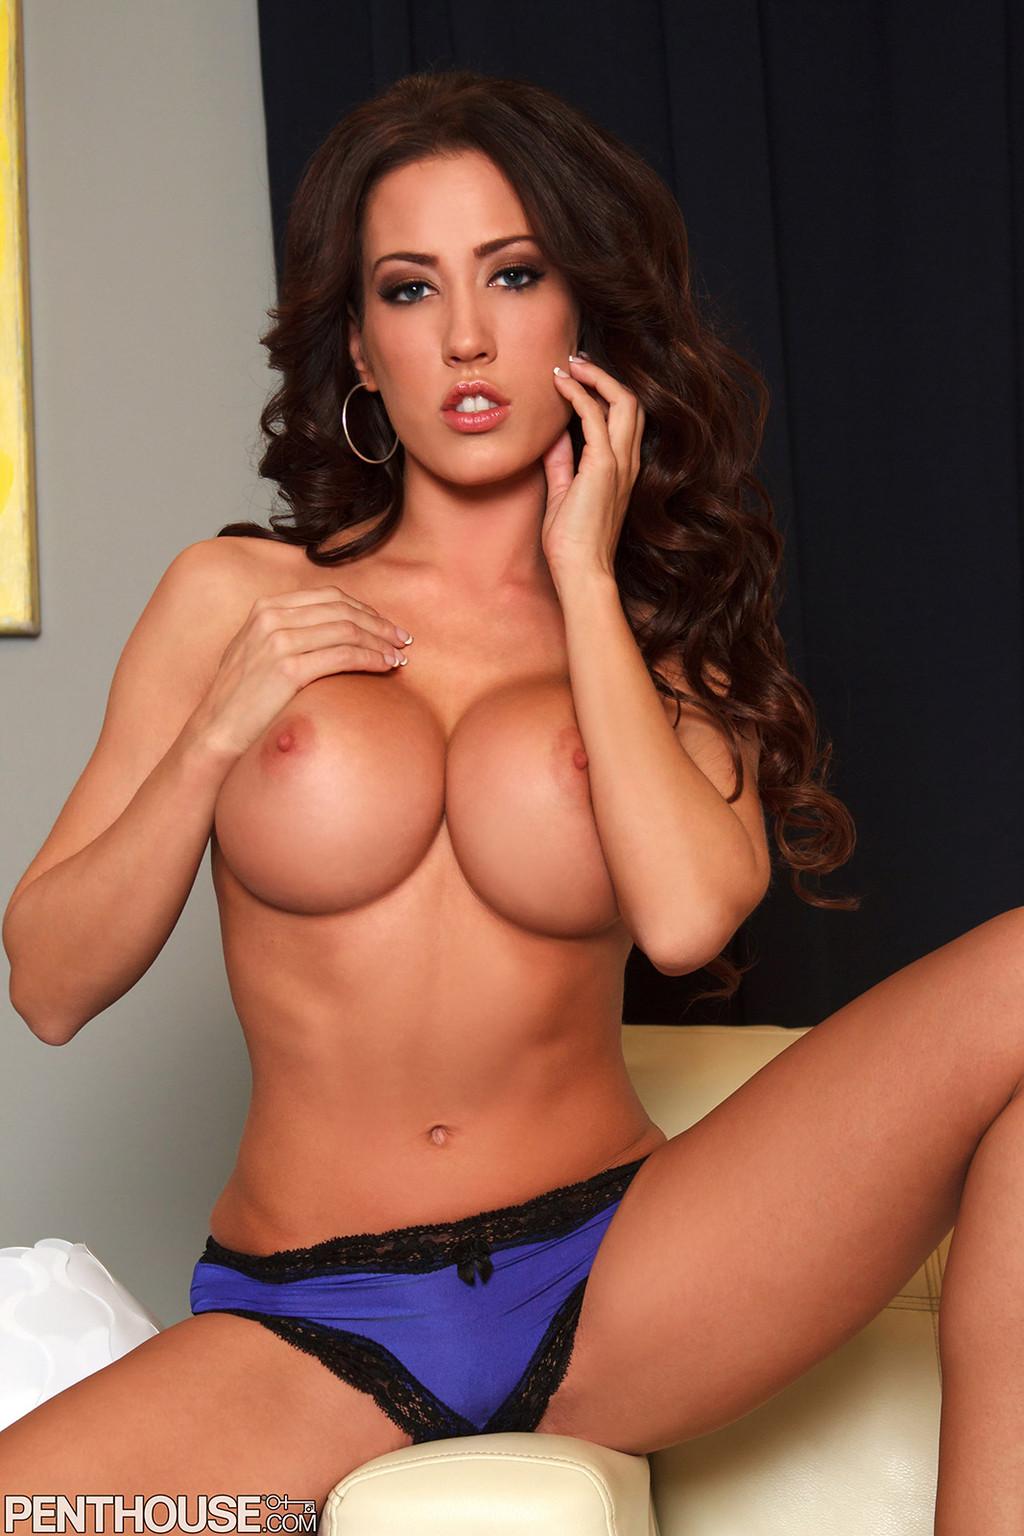 Ass thai adult xxx sexy hot girls canada images